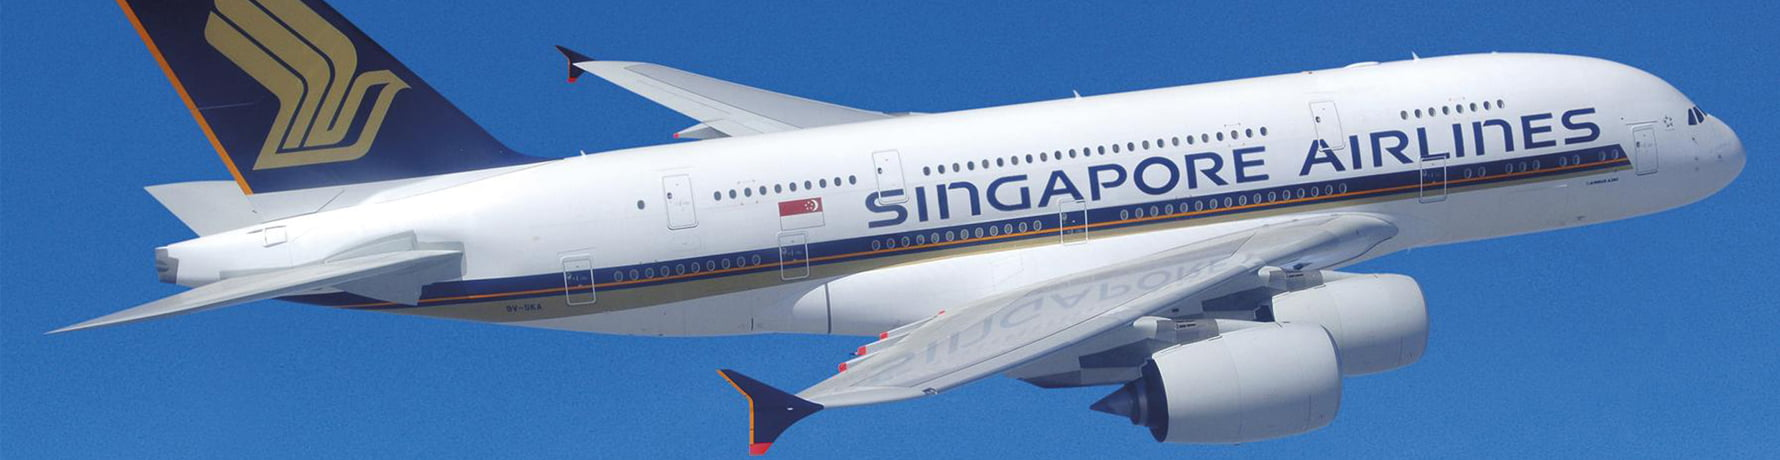 Reserva de vuelos hasta australia